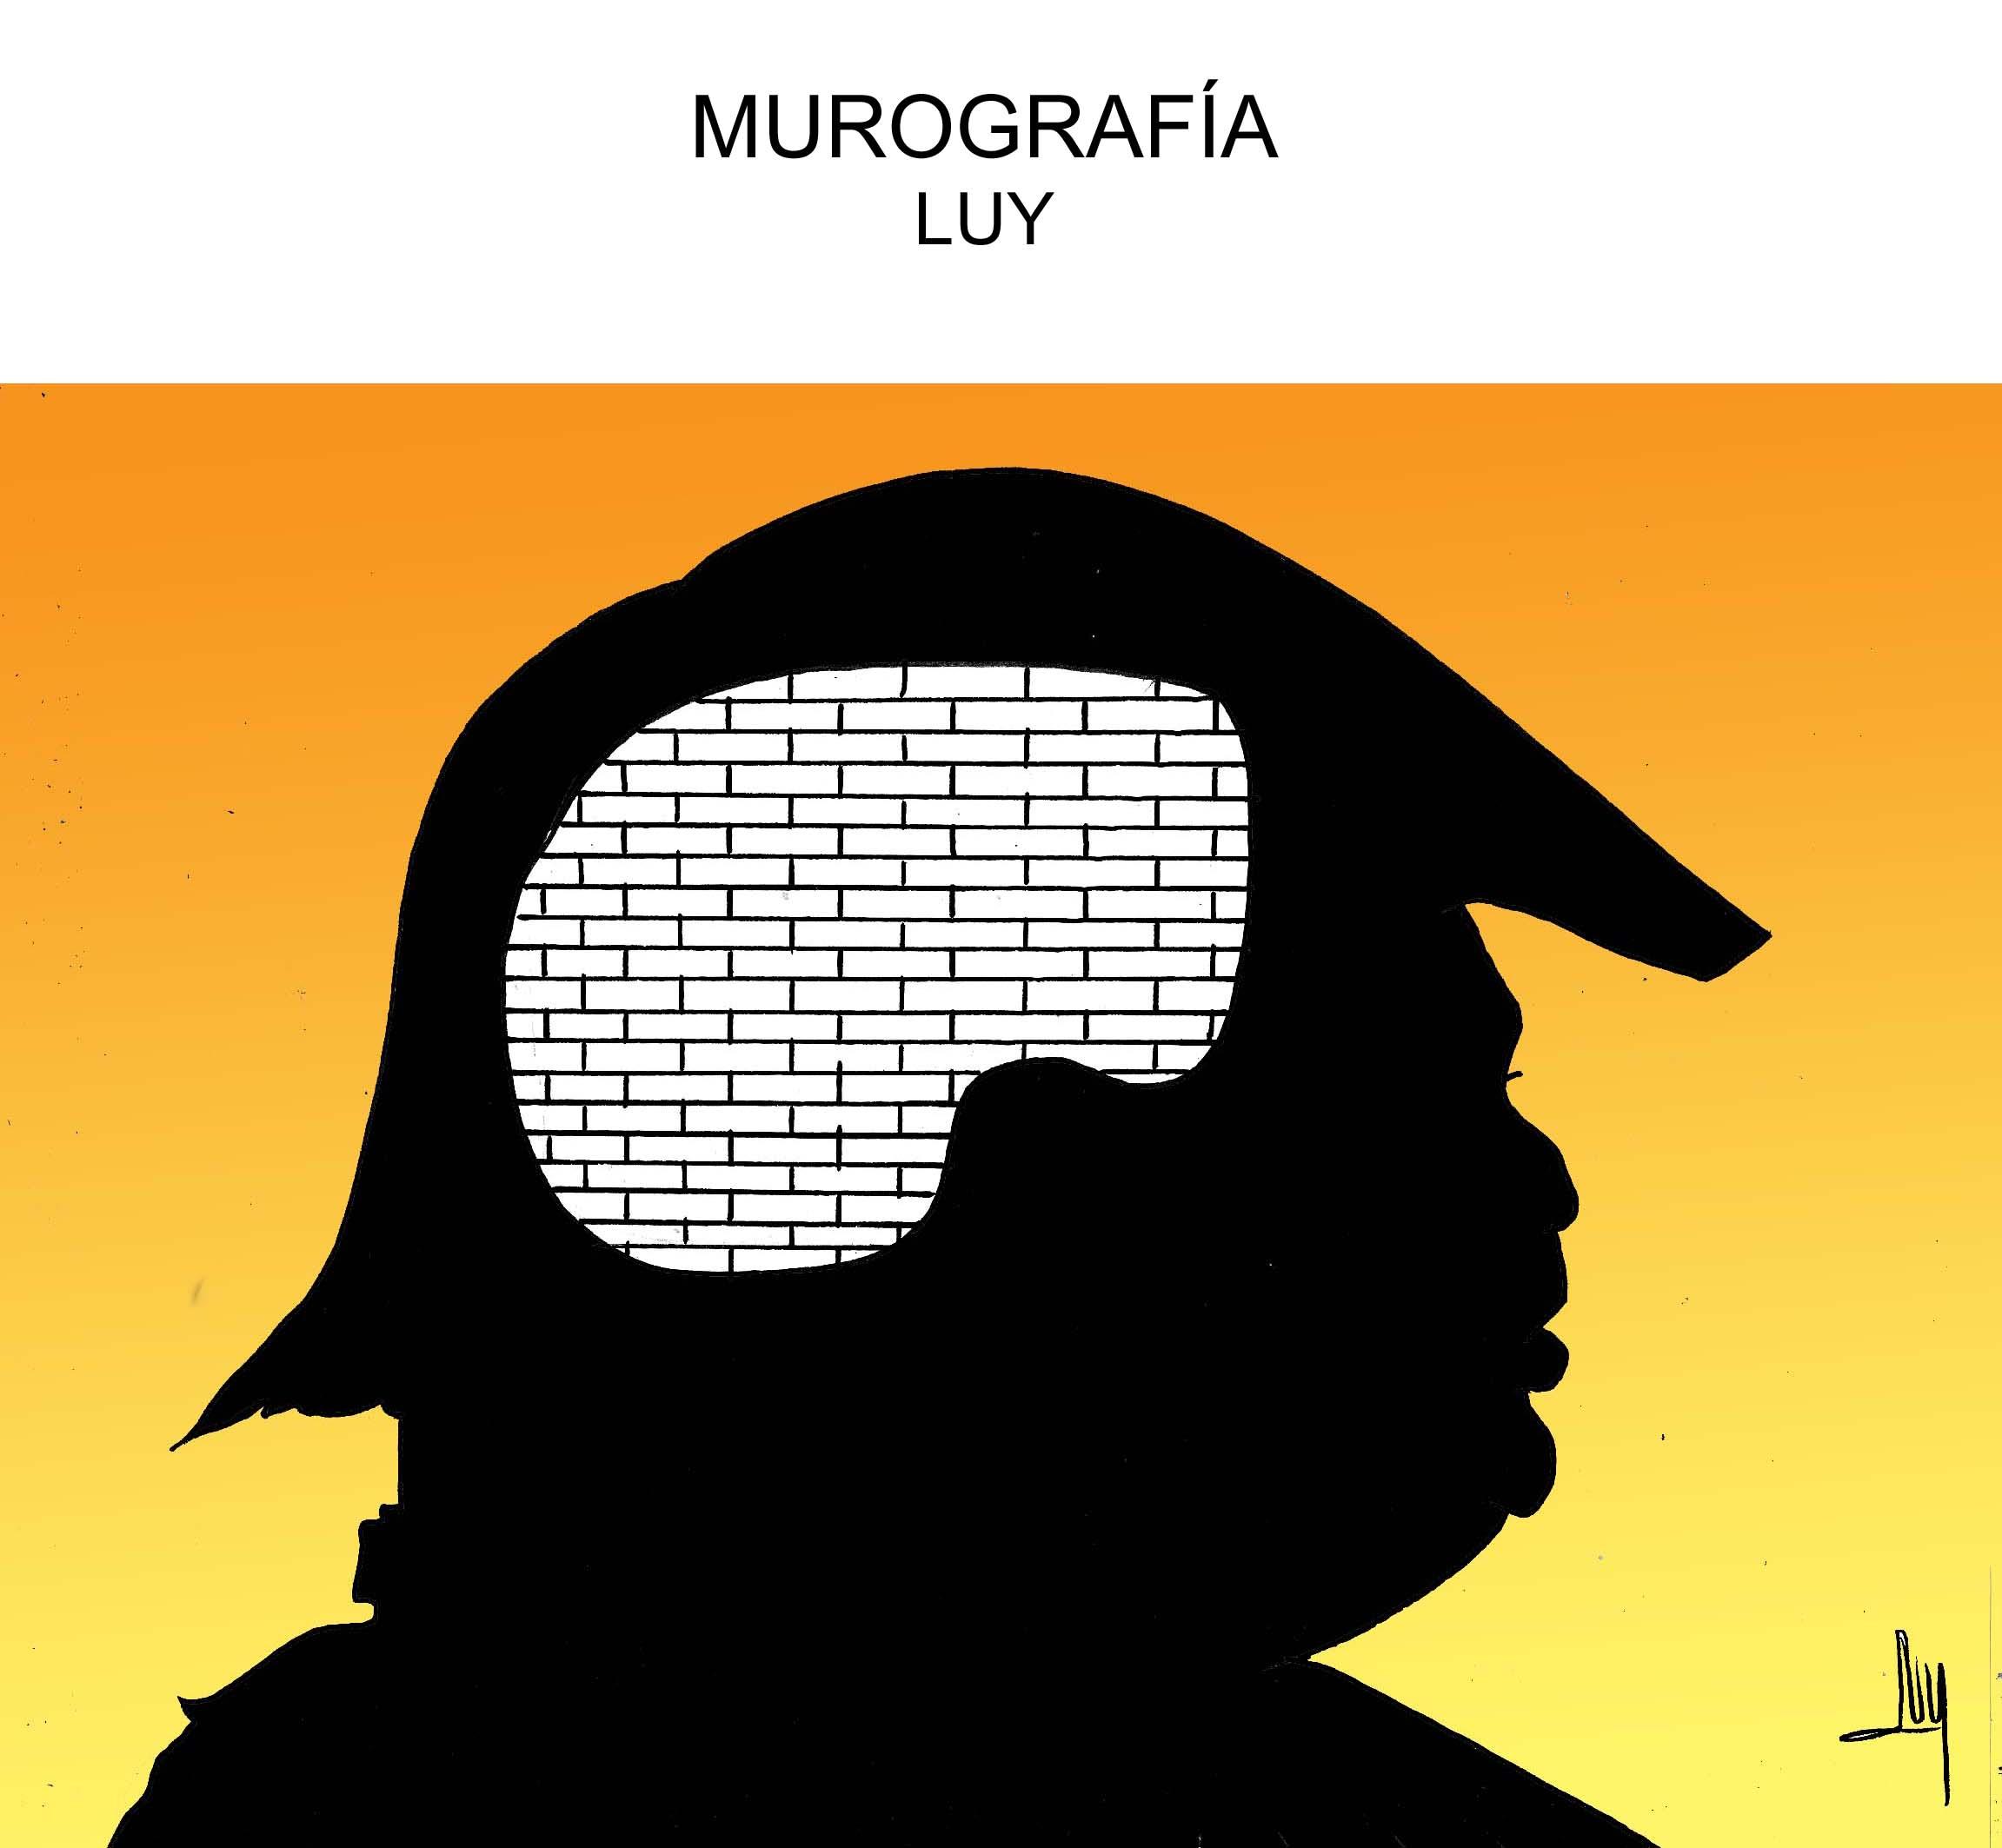 murografia